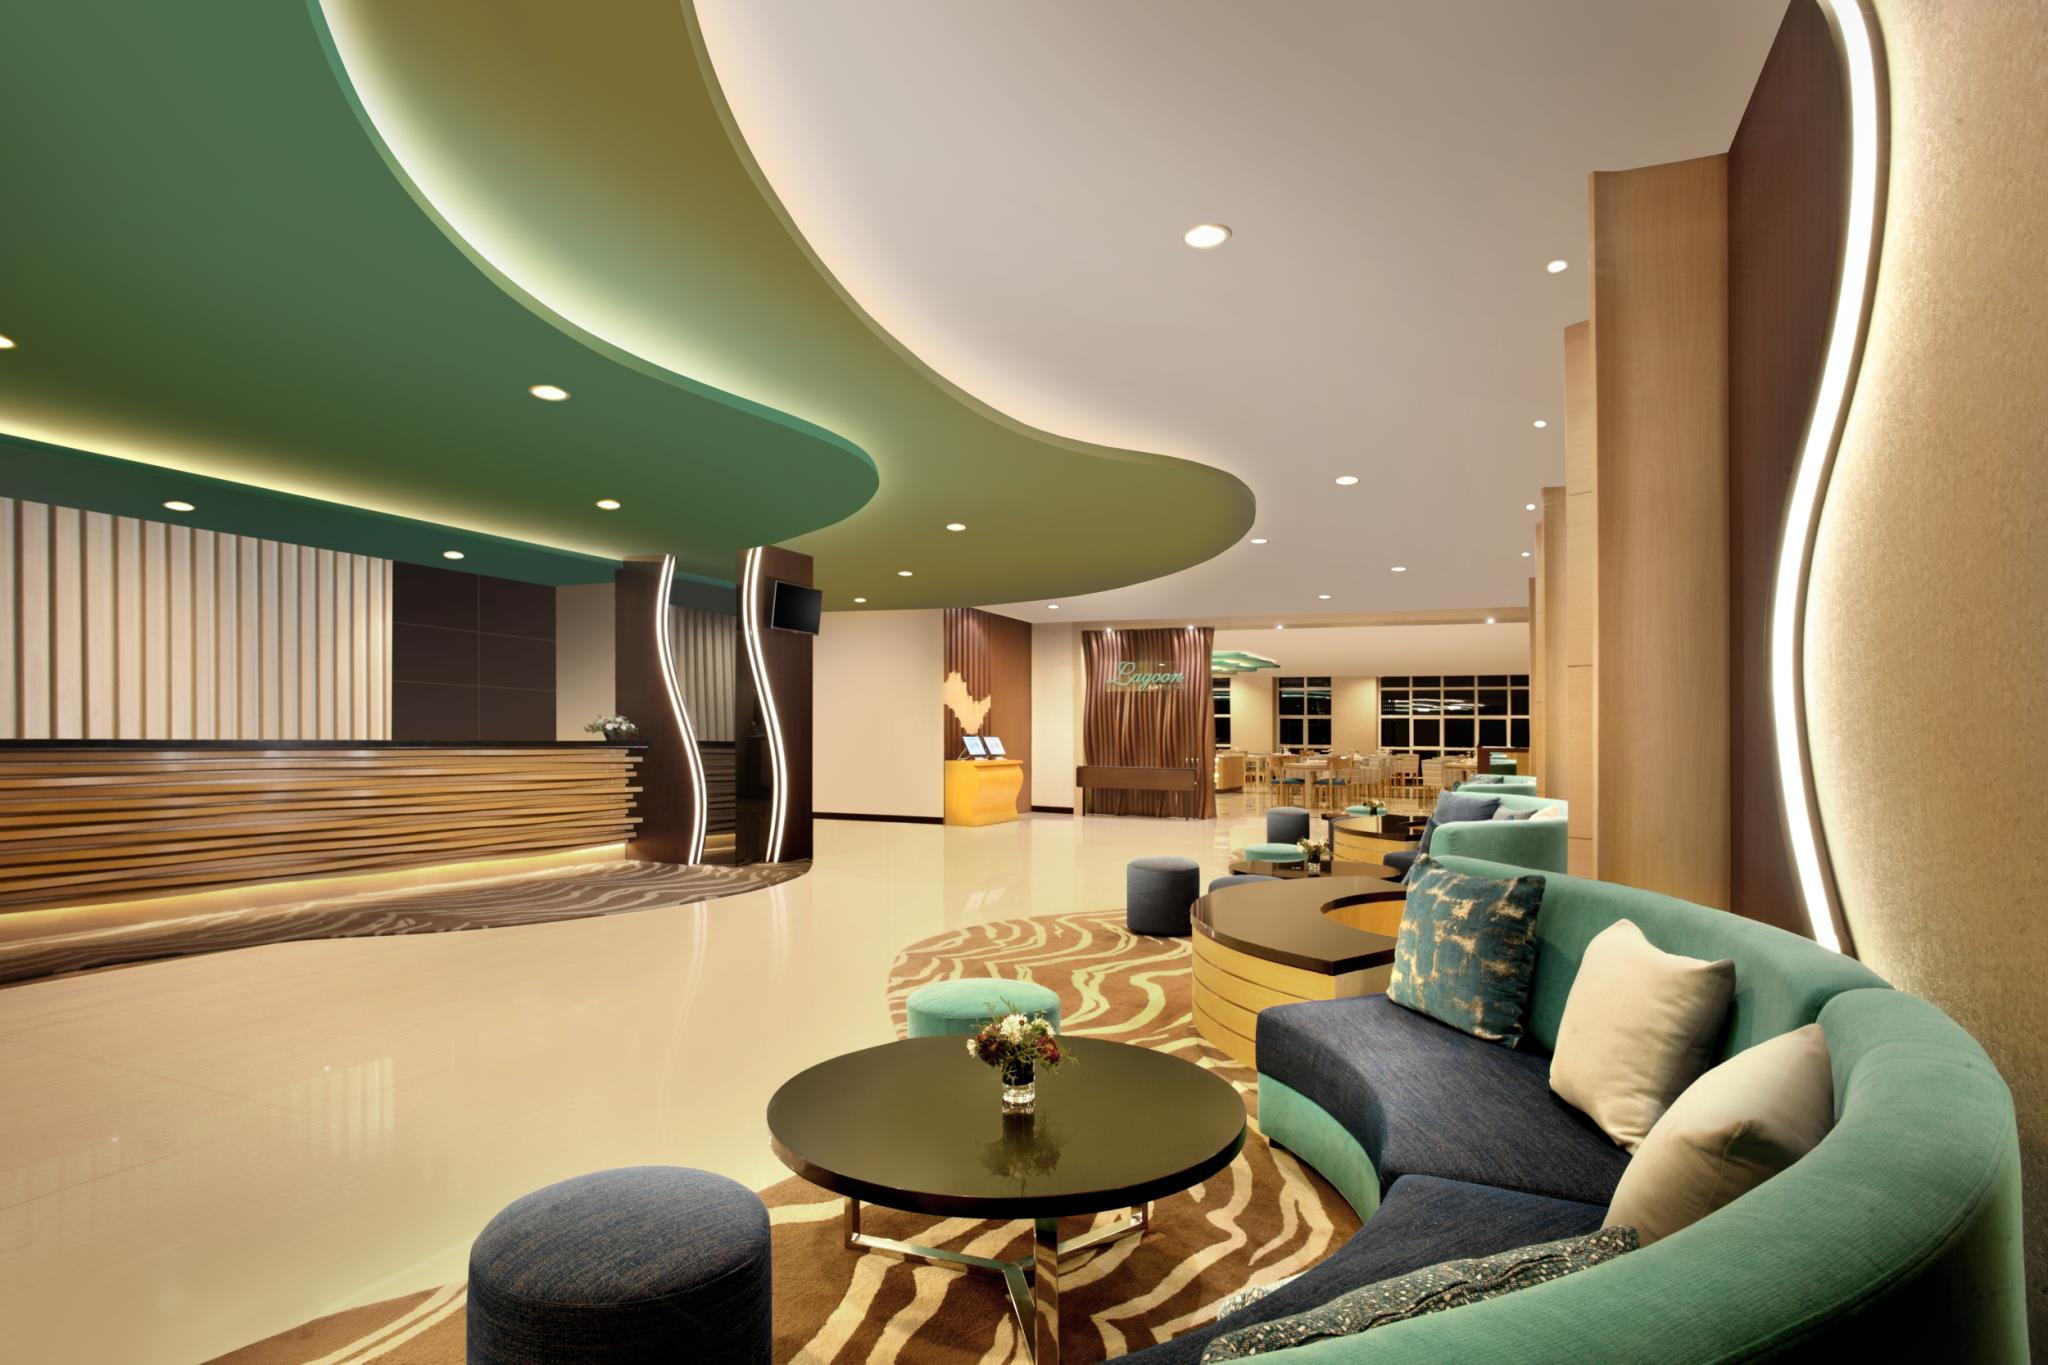 Hotel Best Western The Lagoon Hotel - Bahu Mall Jalan Wolter Monginsidi No 1 - Manado